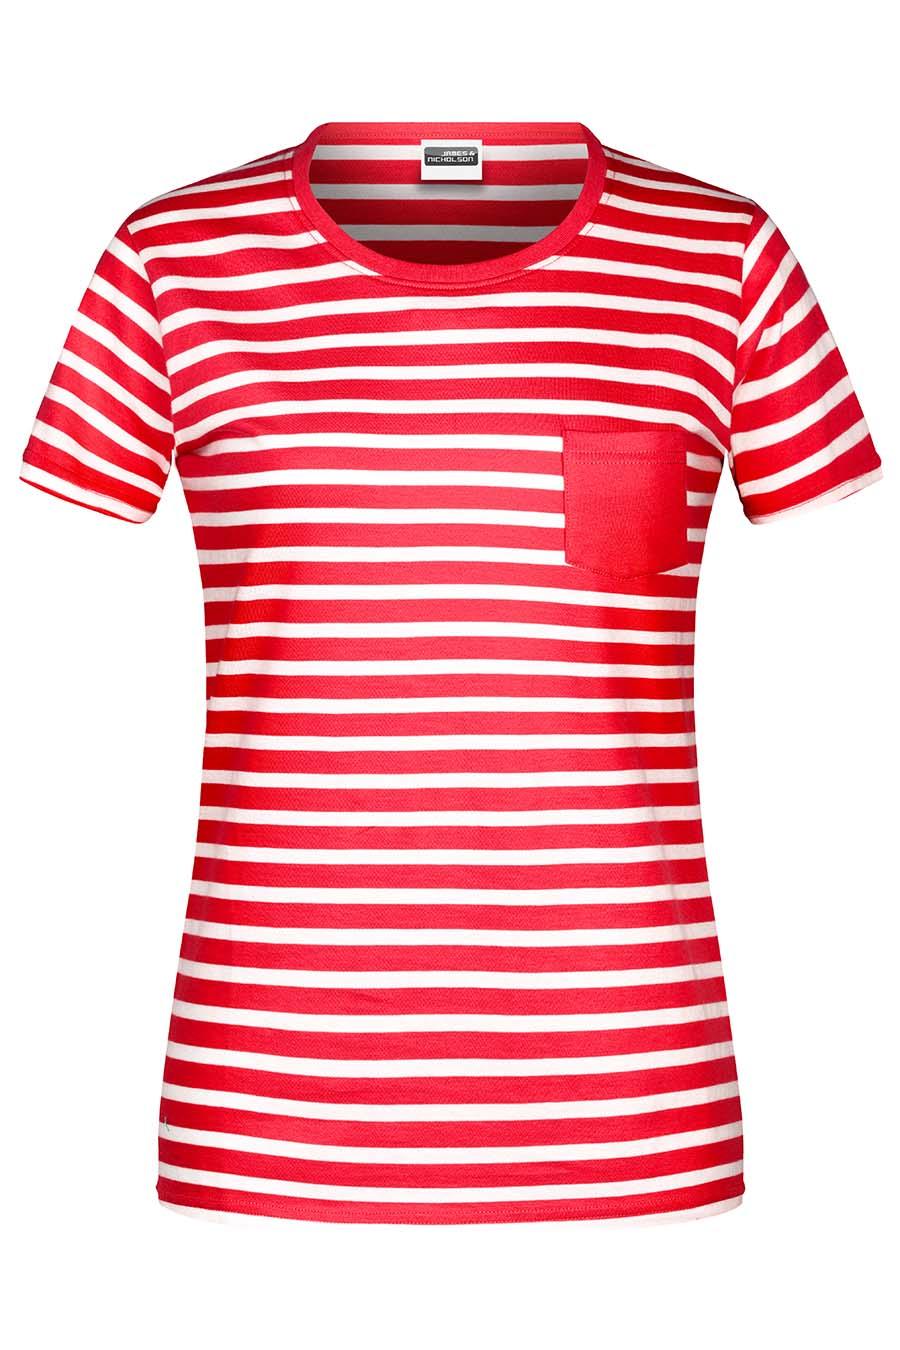 Tee-shirt bio rayé Femme - 20-1490-3